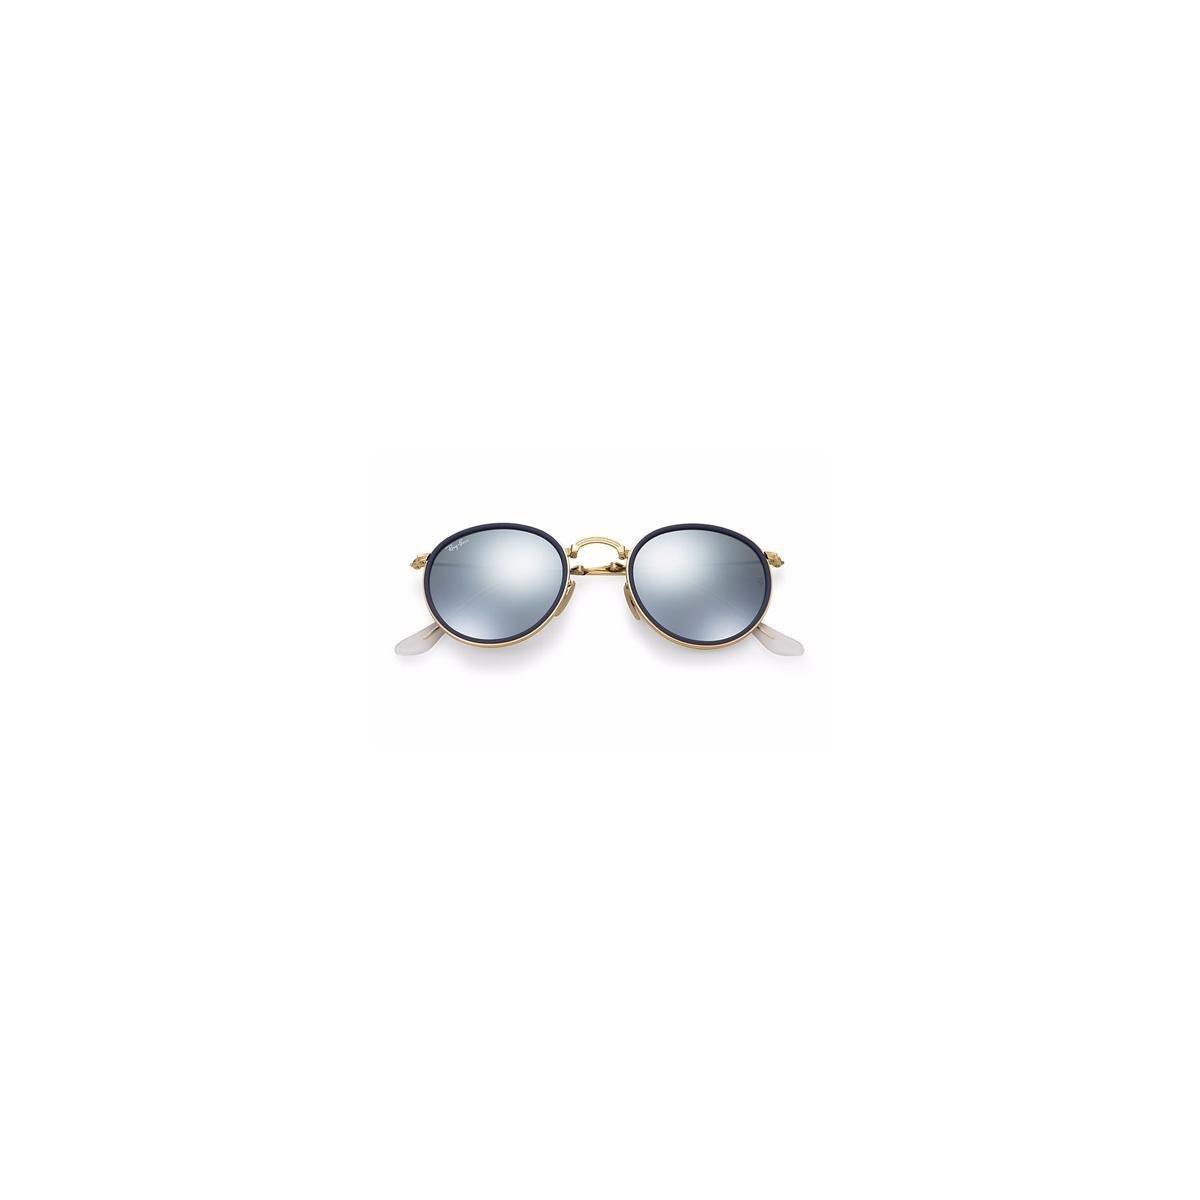 Óculos de Sol Ray Ban Round Dobrável. - Compre Agora  75dd5abf0cdae